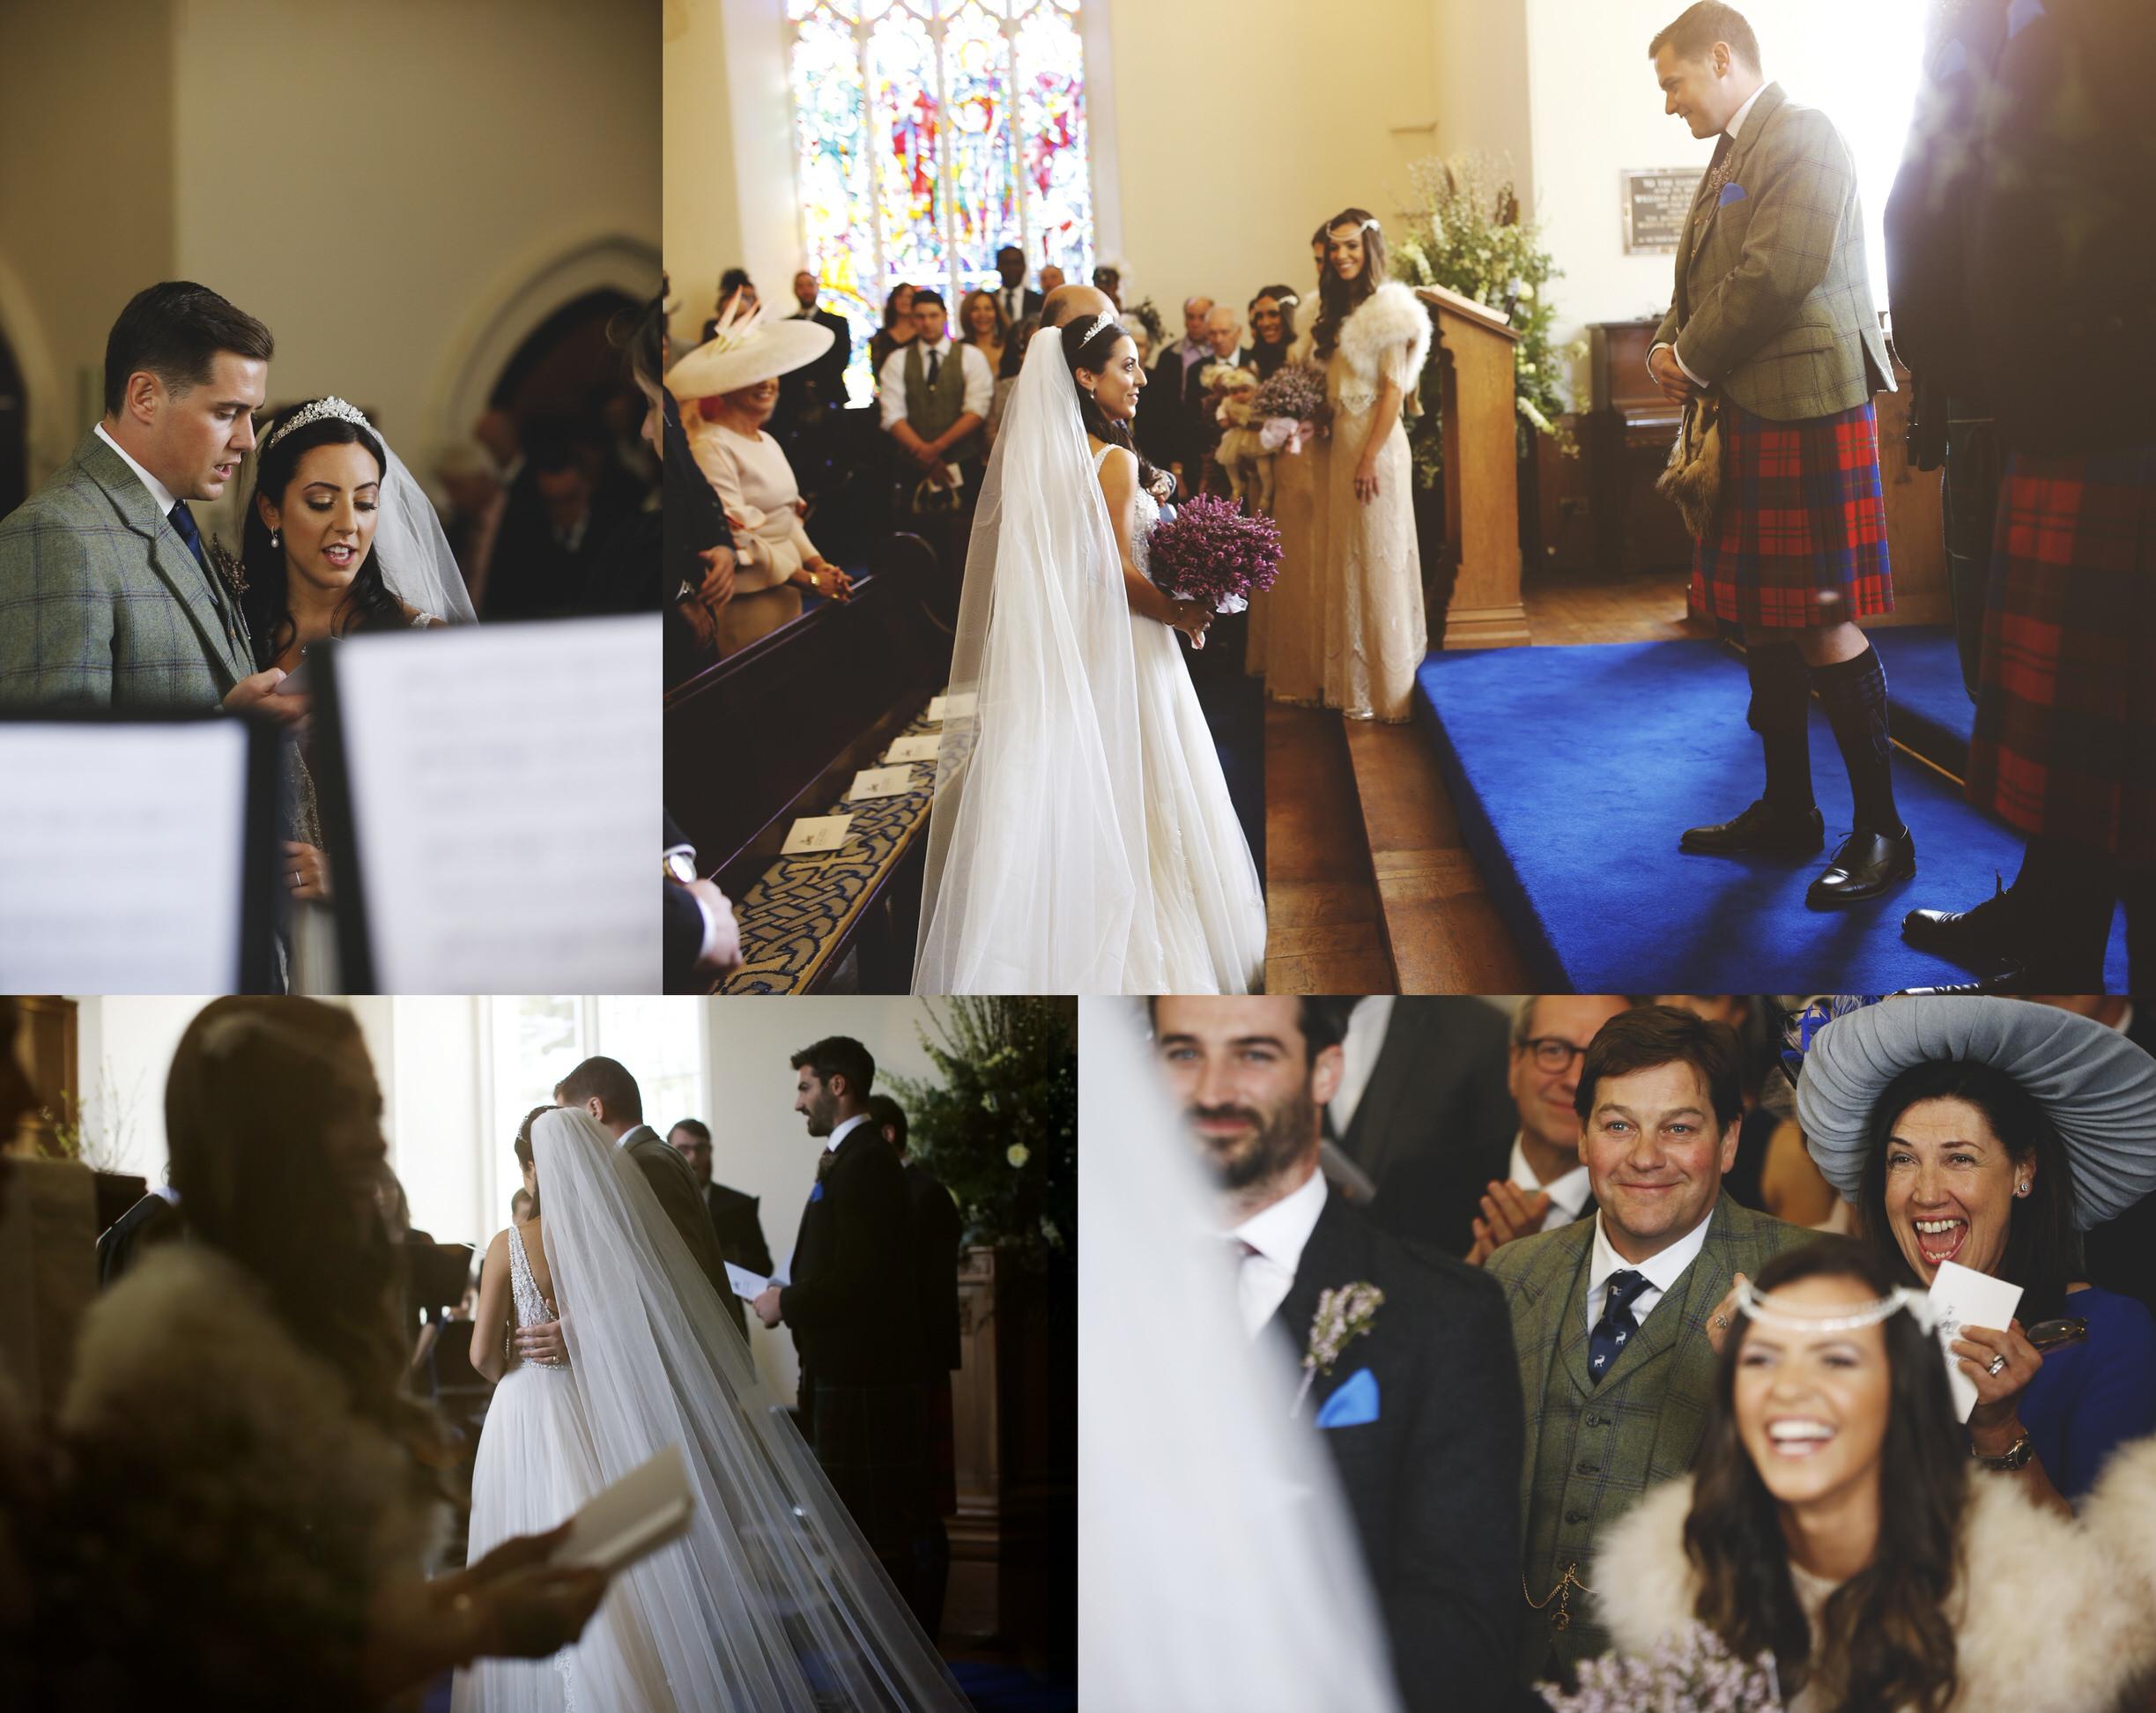 brett-harkness-cotland-wedding-photographer-highland-wedding_0017.jpg